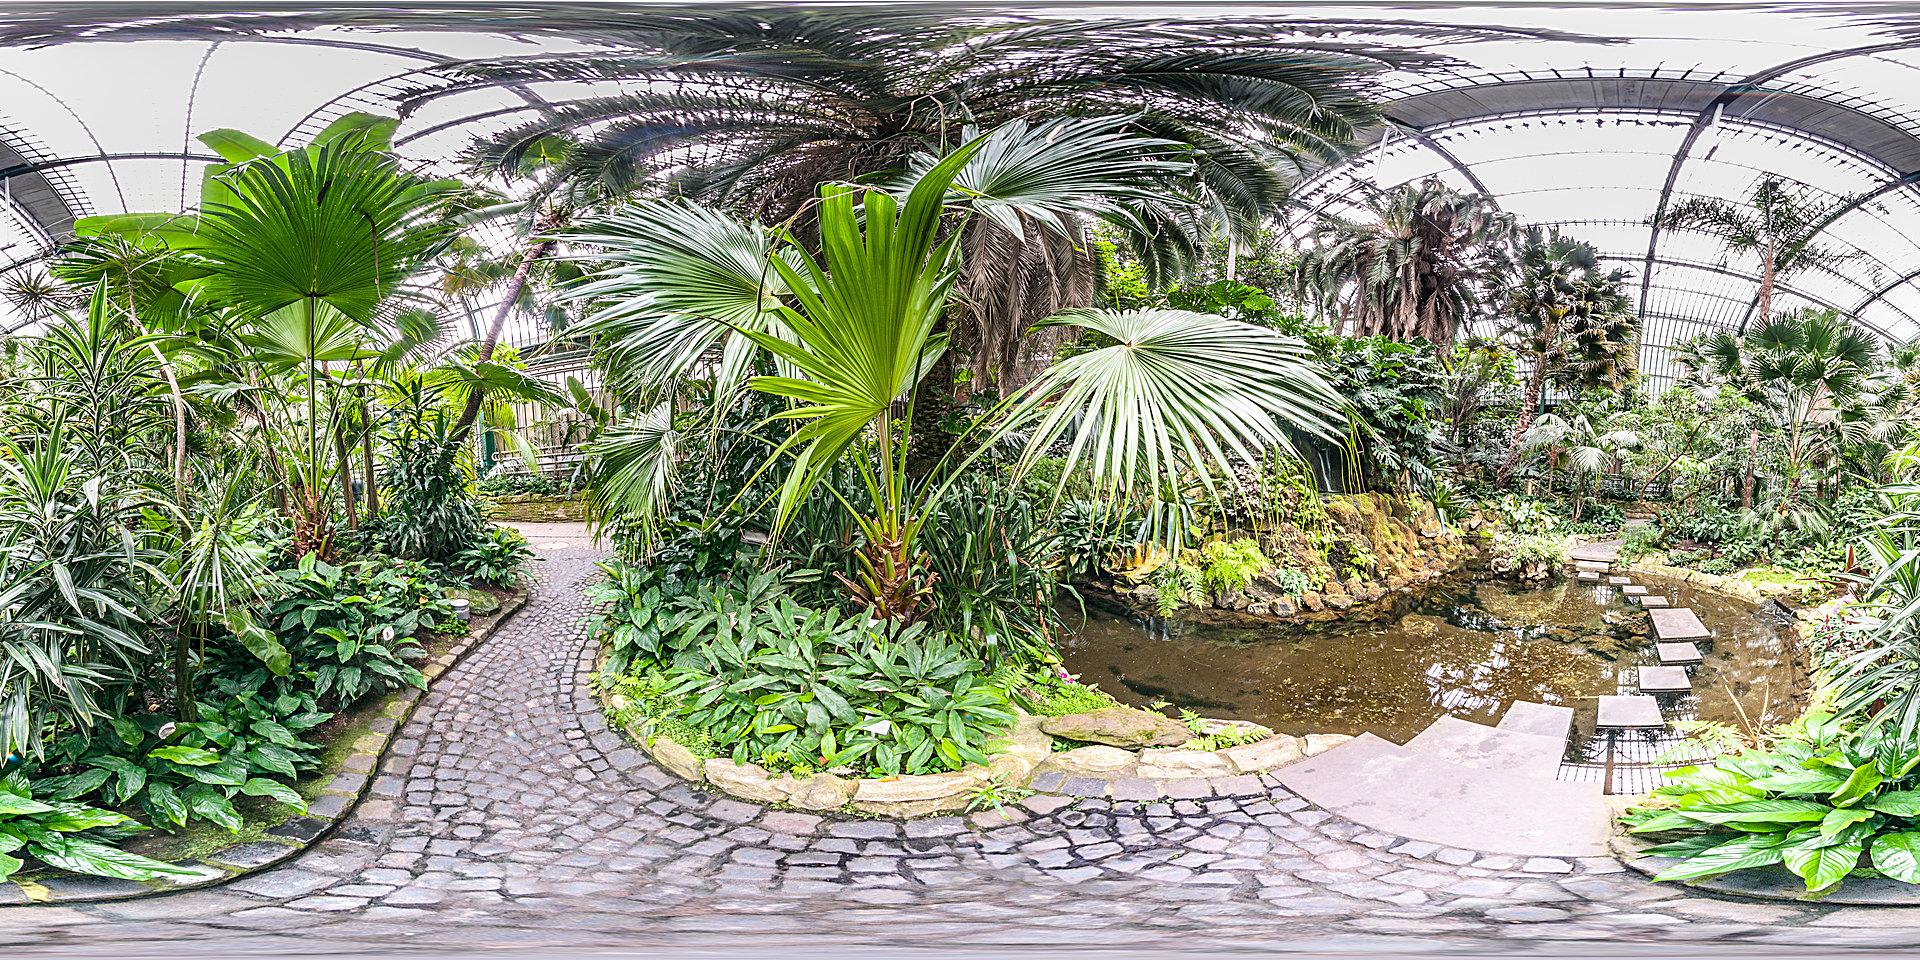 palmengarten botanischer garten. Black Bedroom Furniture Sets. Home Design Ideas